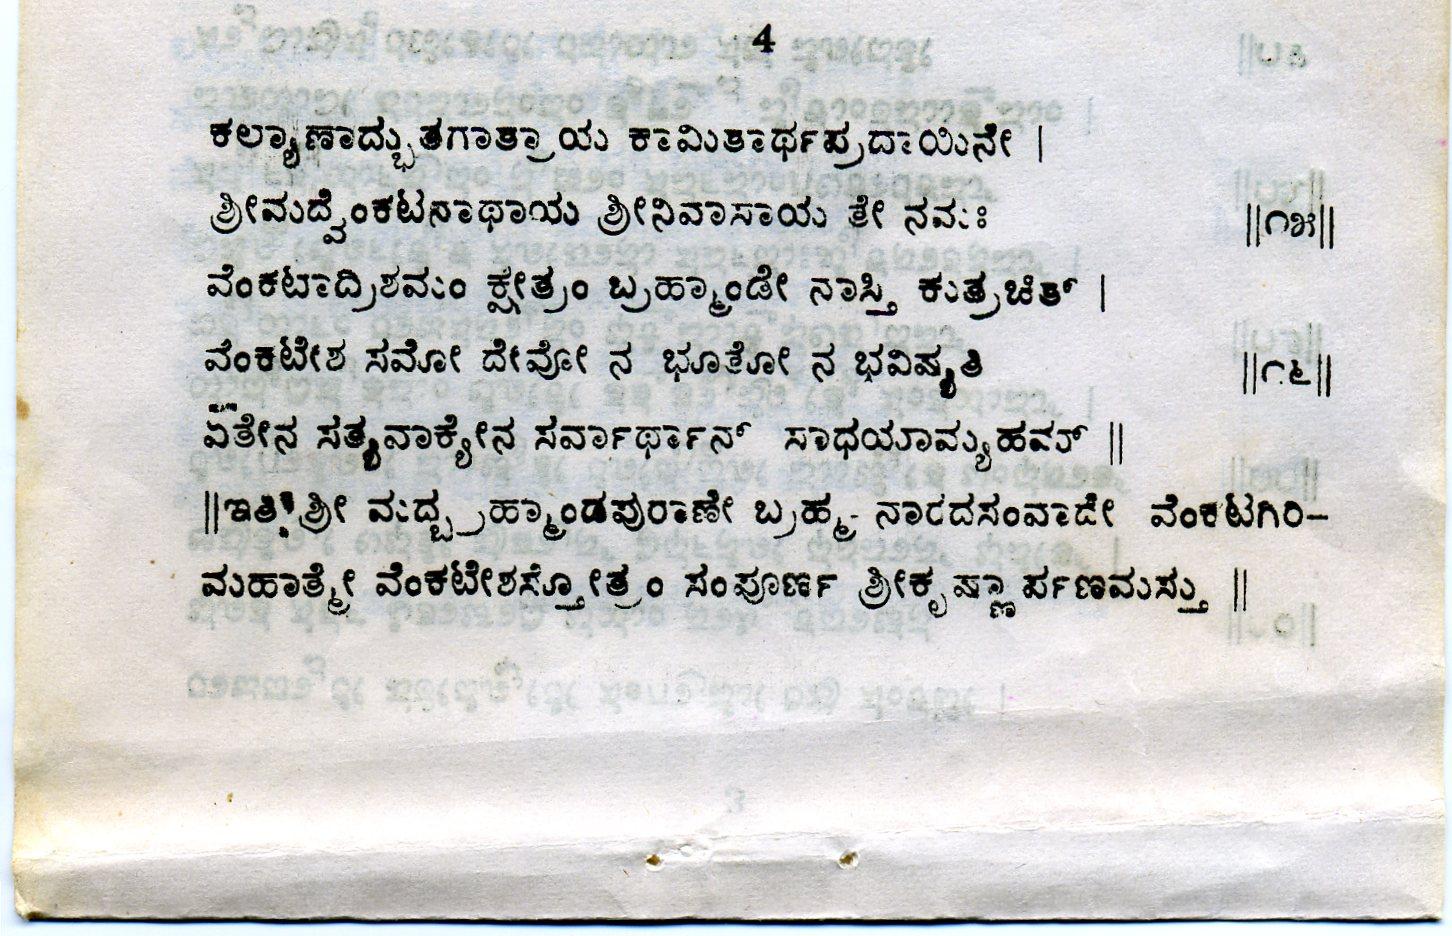 Shree Guru Raghavendra Swamy: Sri Venkateshwara Stotram